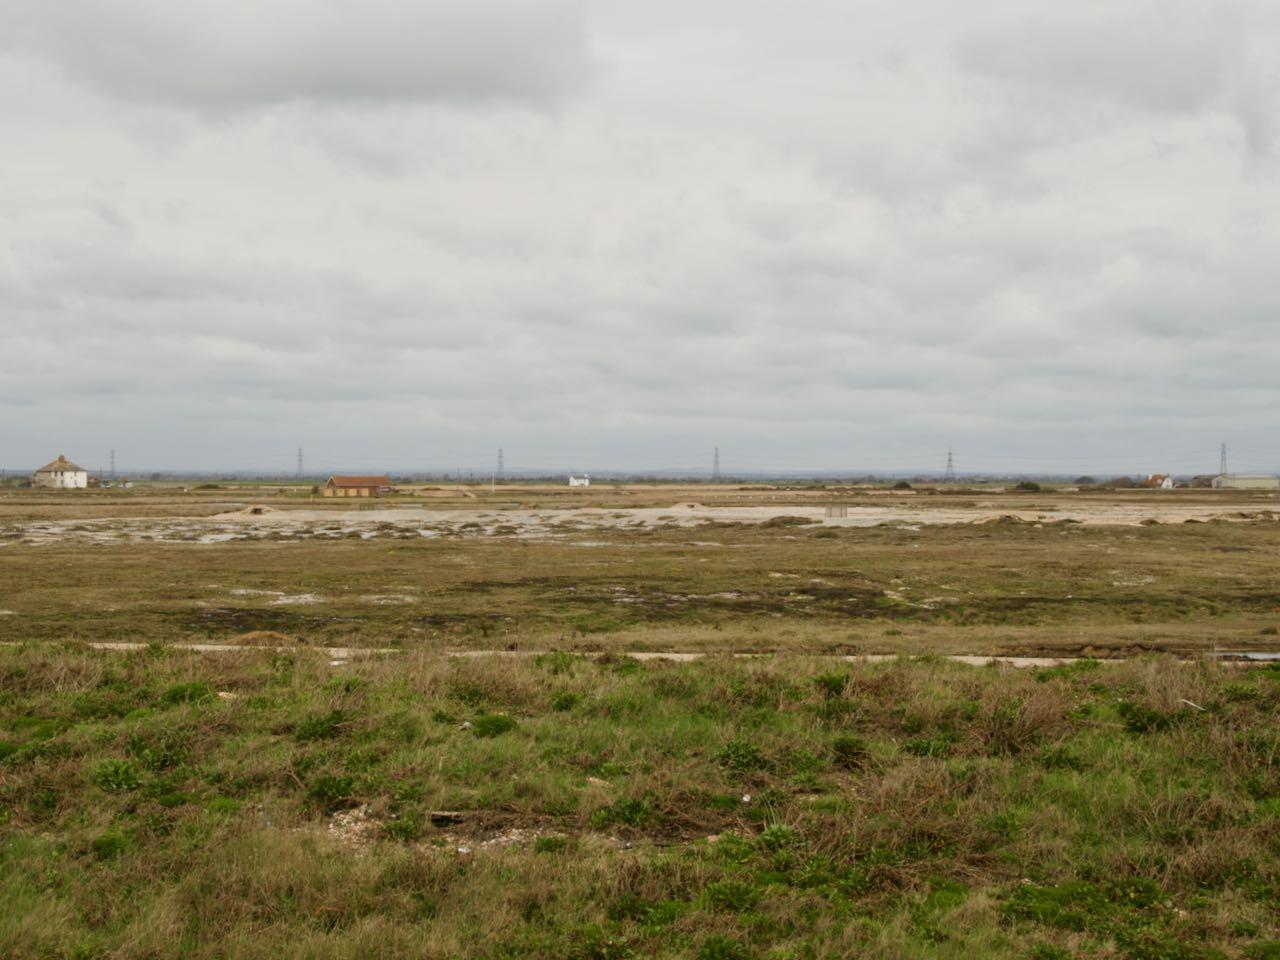 Jurys Gap, Lydd Ranges, Kent